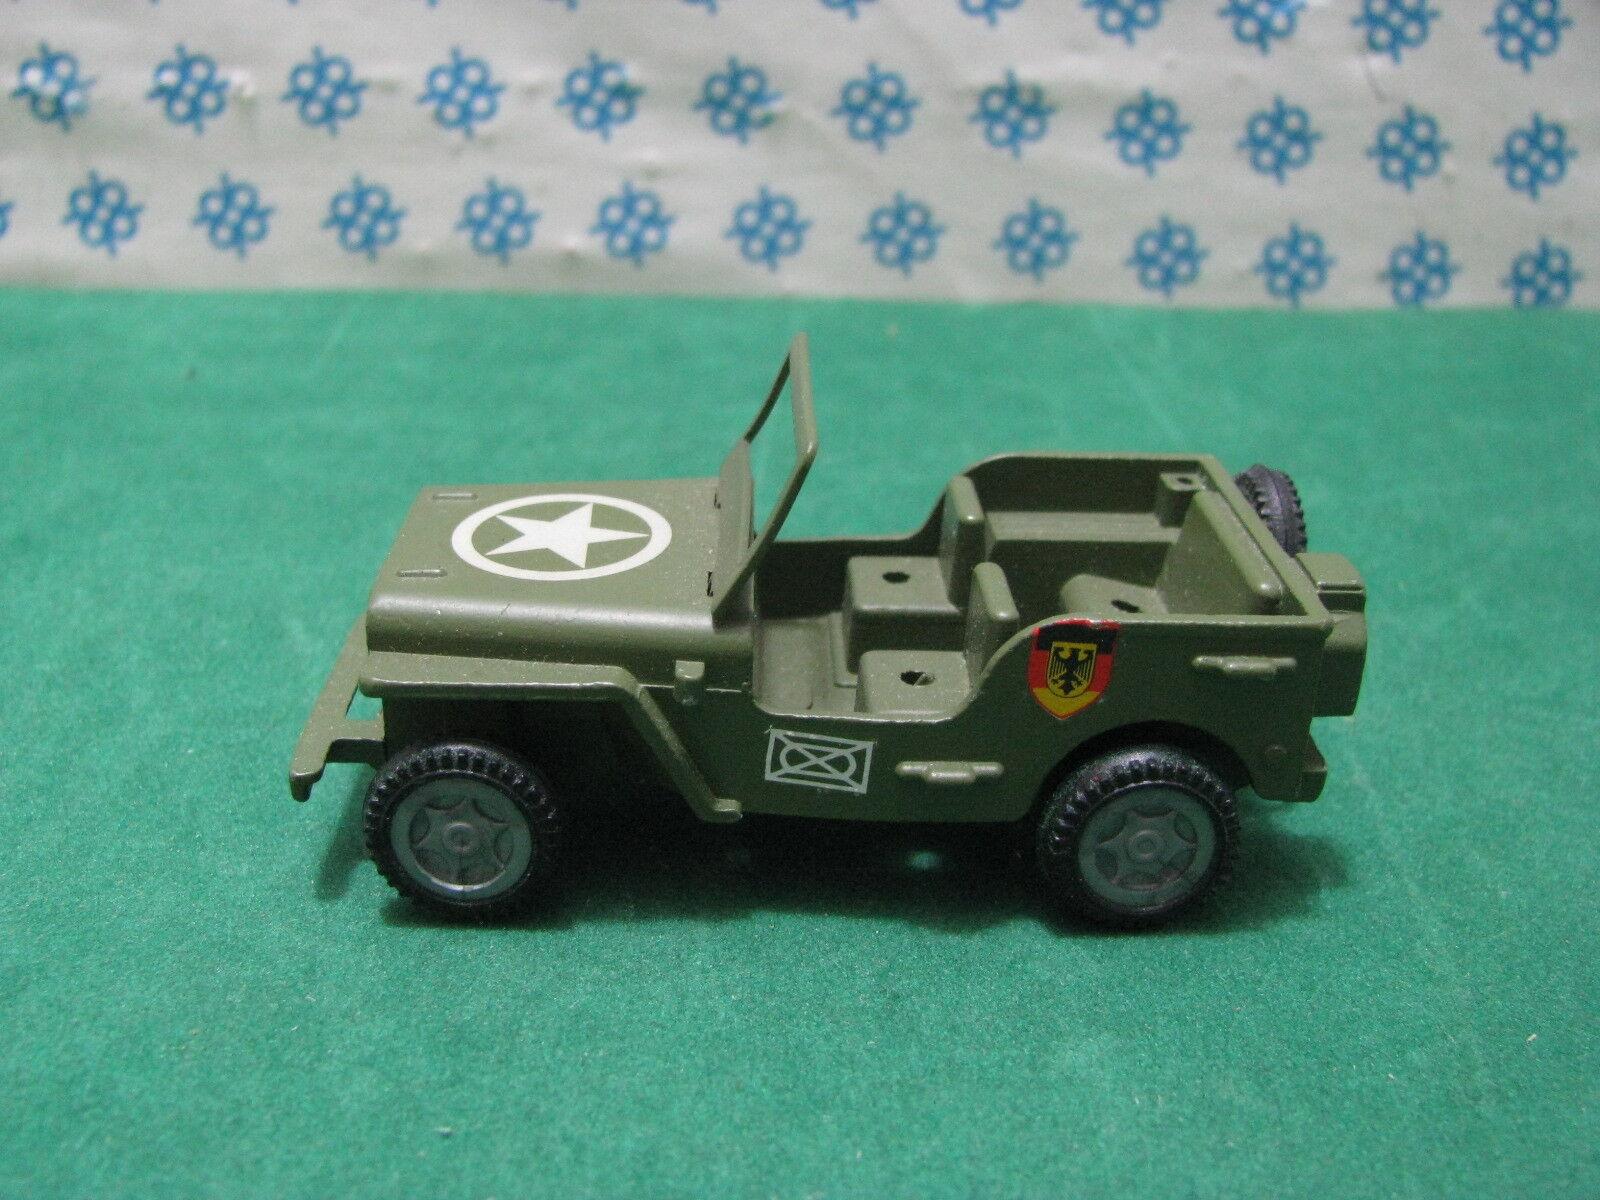 Vintage  Military   -  JEEP            -  GAMA  904-4-5-6-   Western Germany 5ceeab